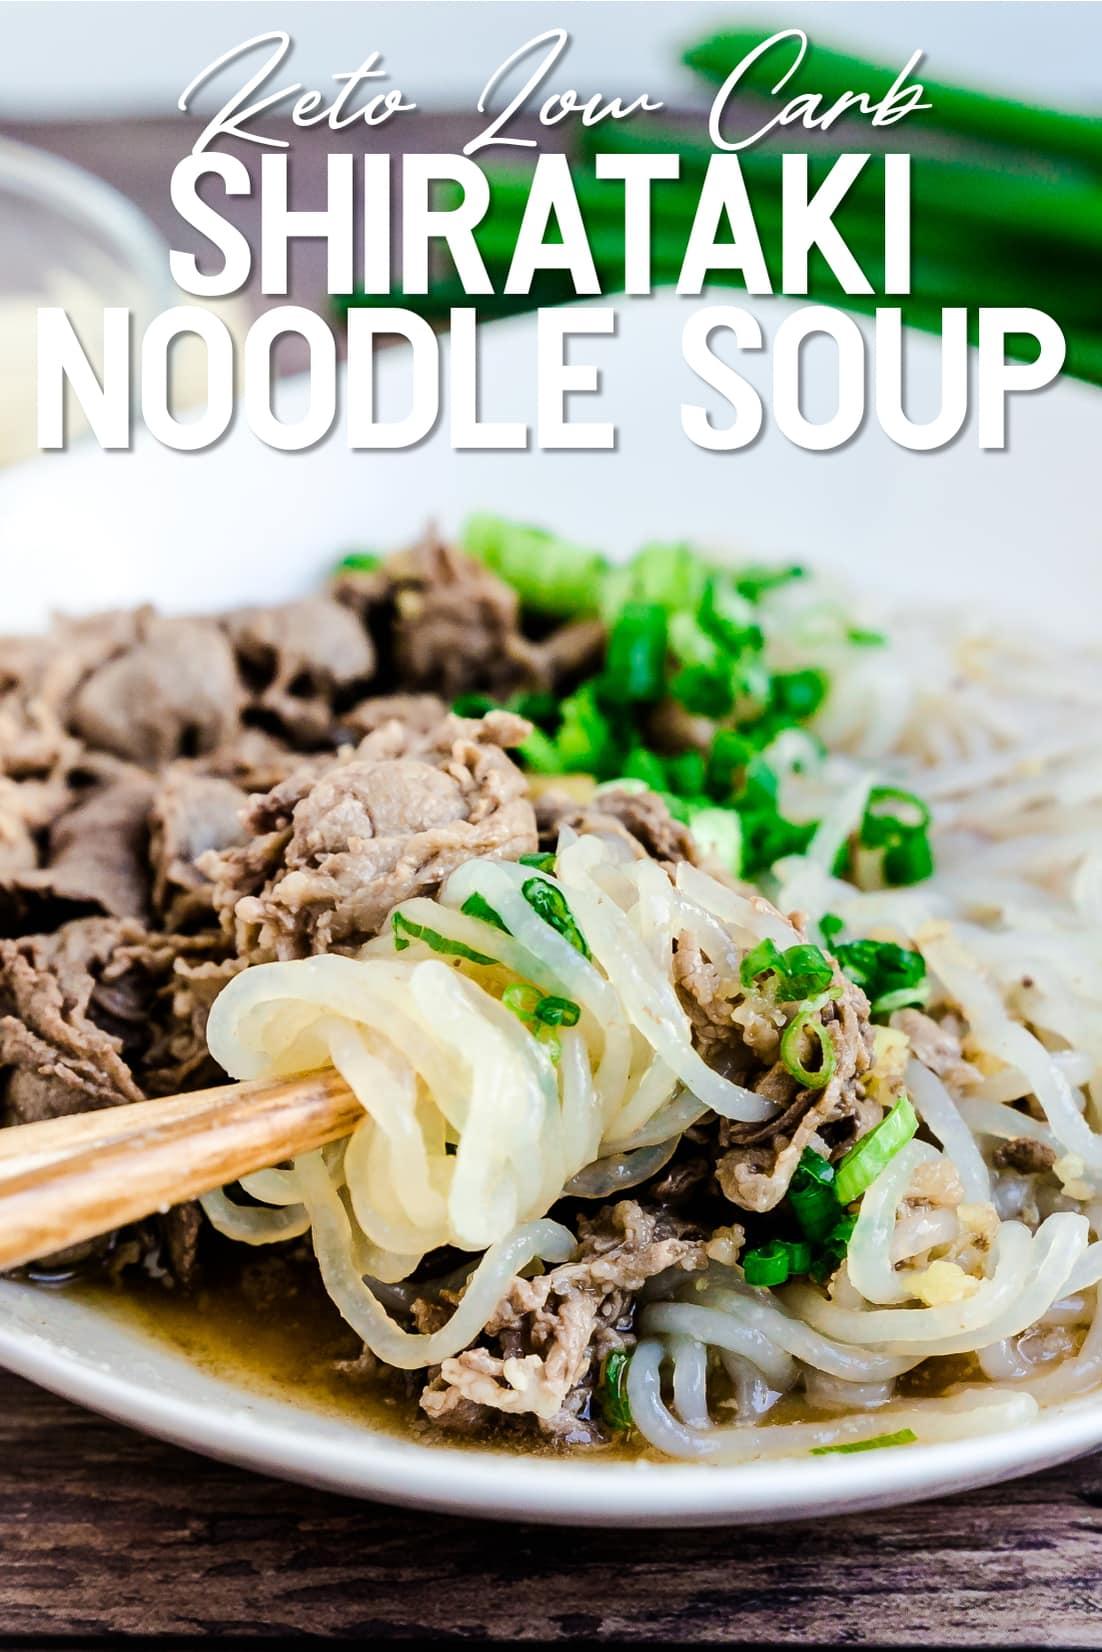 Japanese Beef Shirataki Noodle Soup with chopsticks